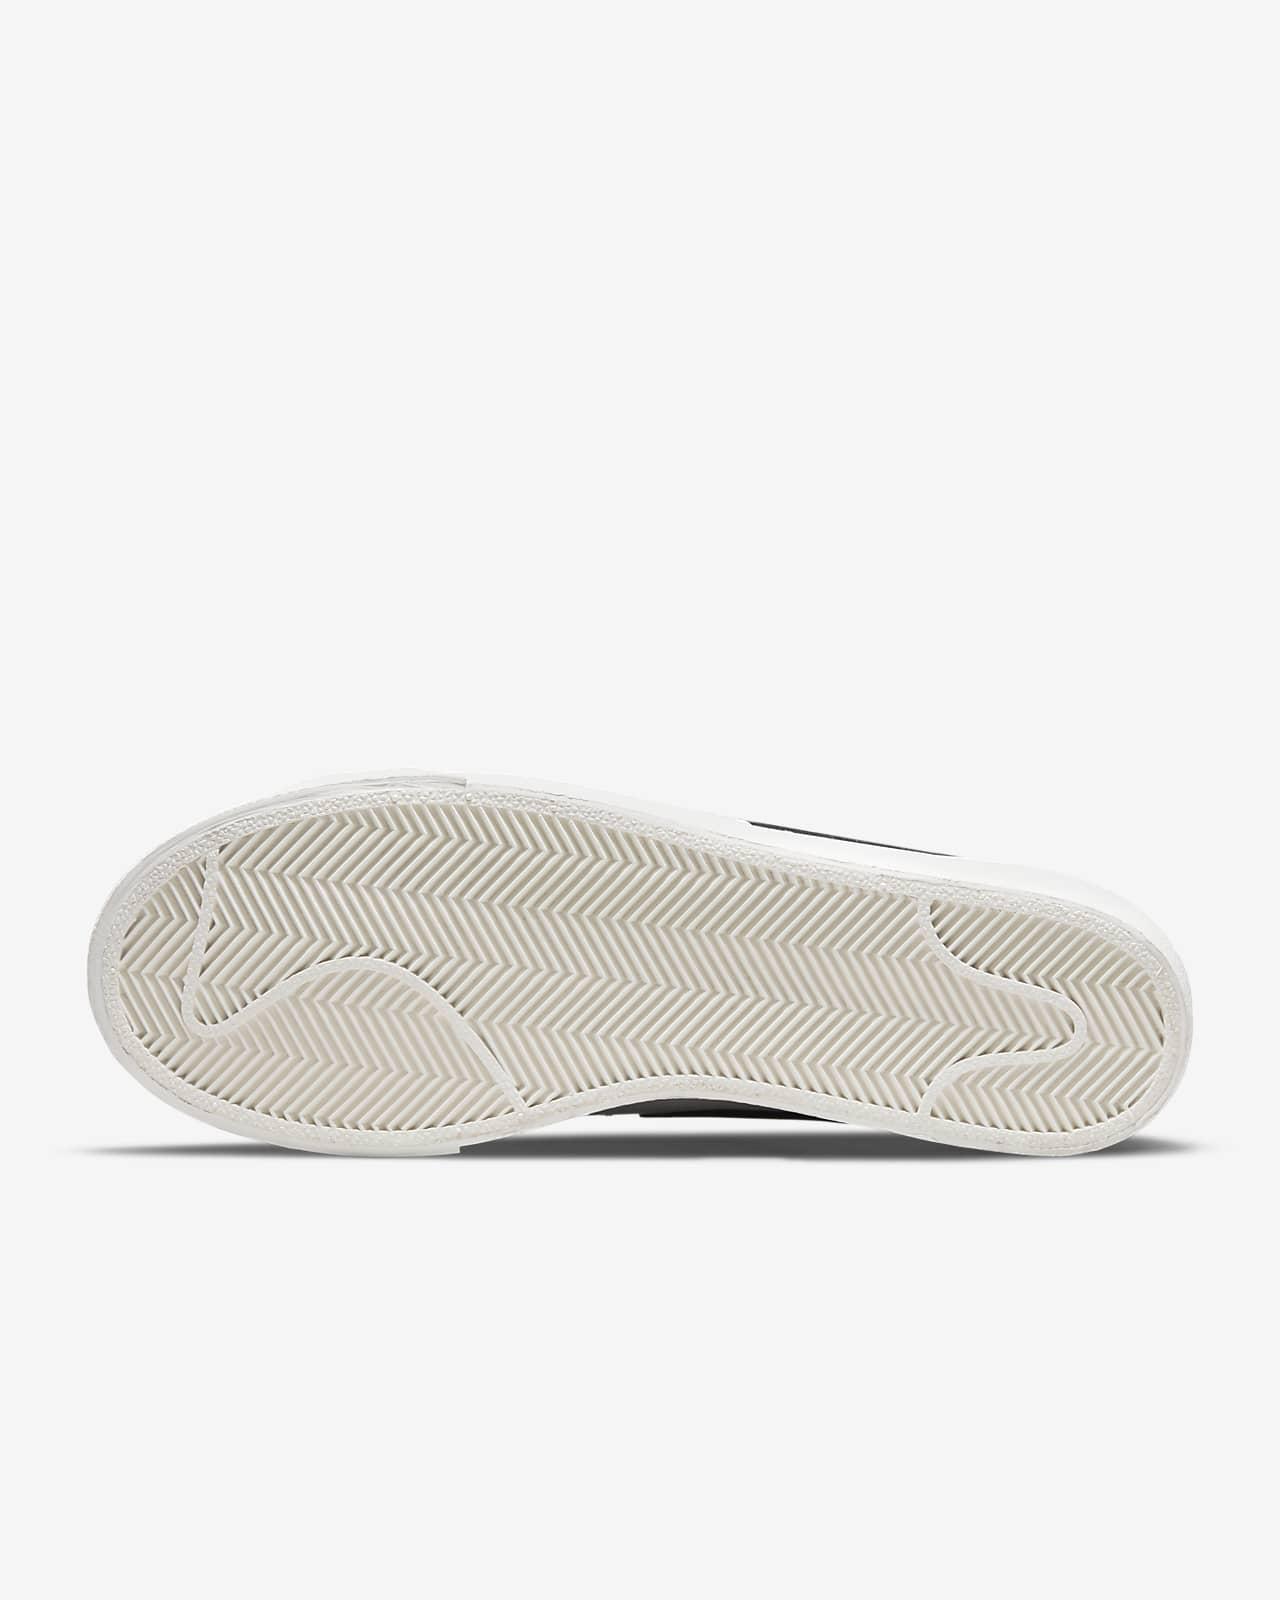 Chaussures Nike Blazer Low Platform pour Femme. Nike LU